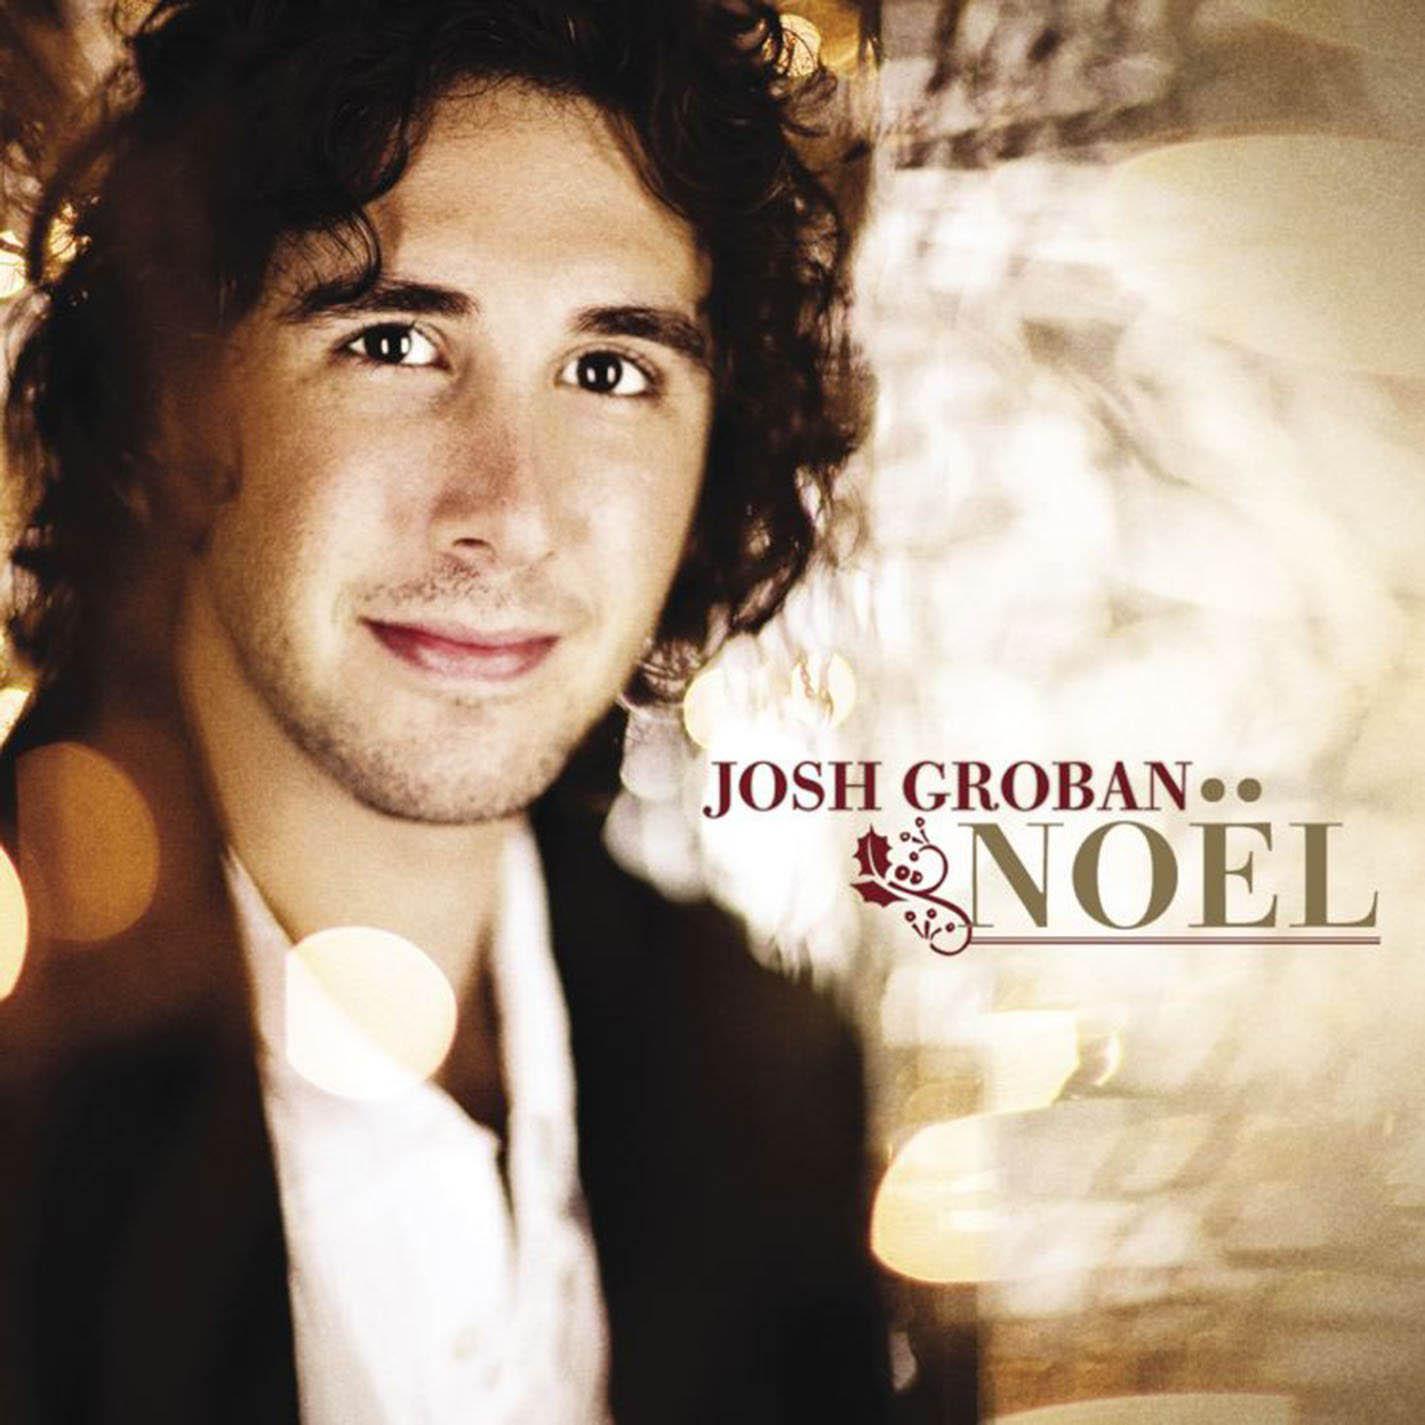 Josh Groban Noel (10th Anniversary Edition)